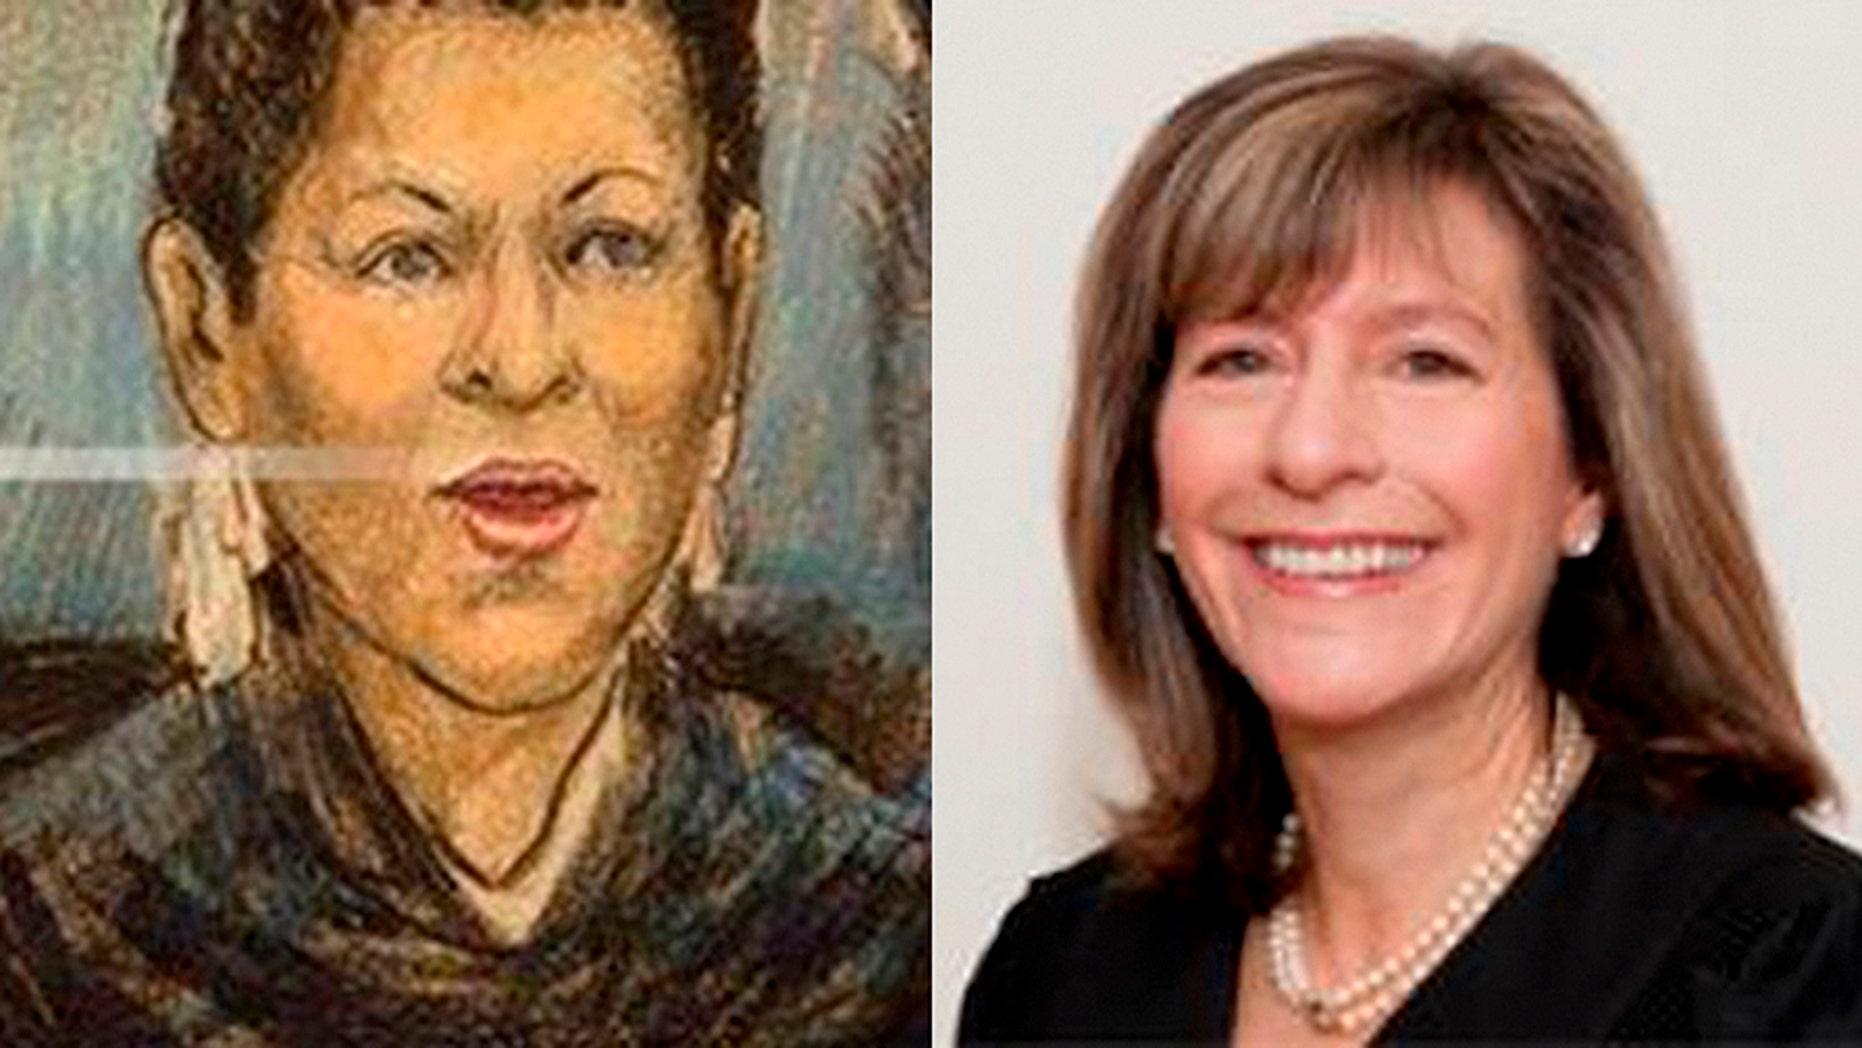 An artist's rendering shows Magistrate Judge Deborah A. Robinson, left, and U.S. District Judge Amy Berman Jackson.